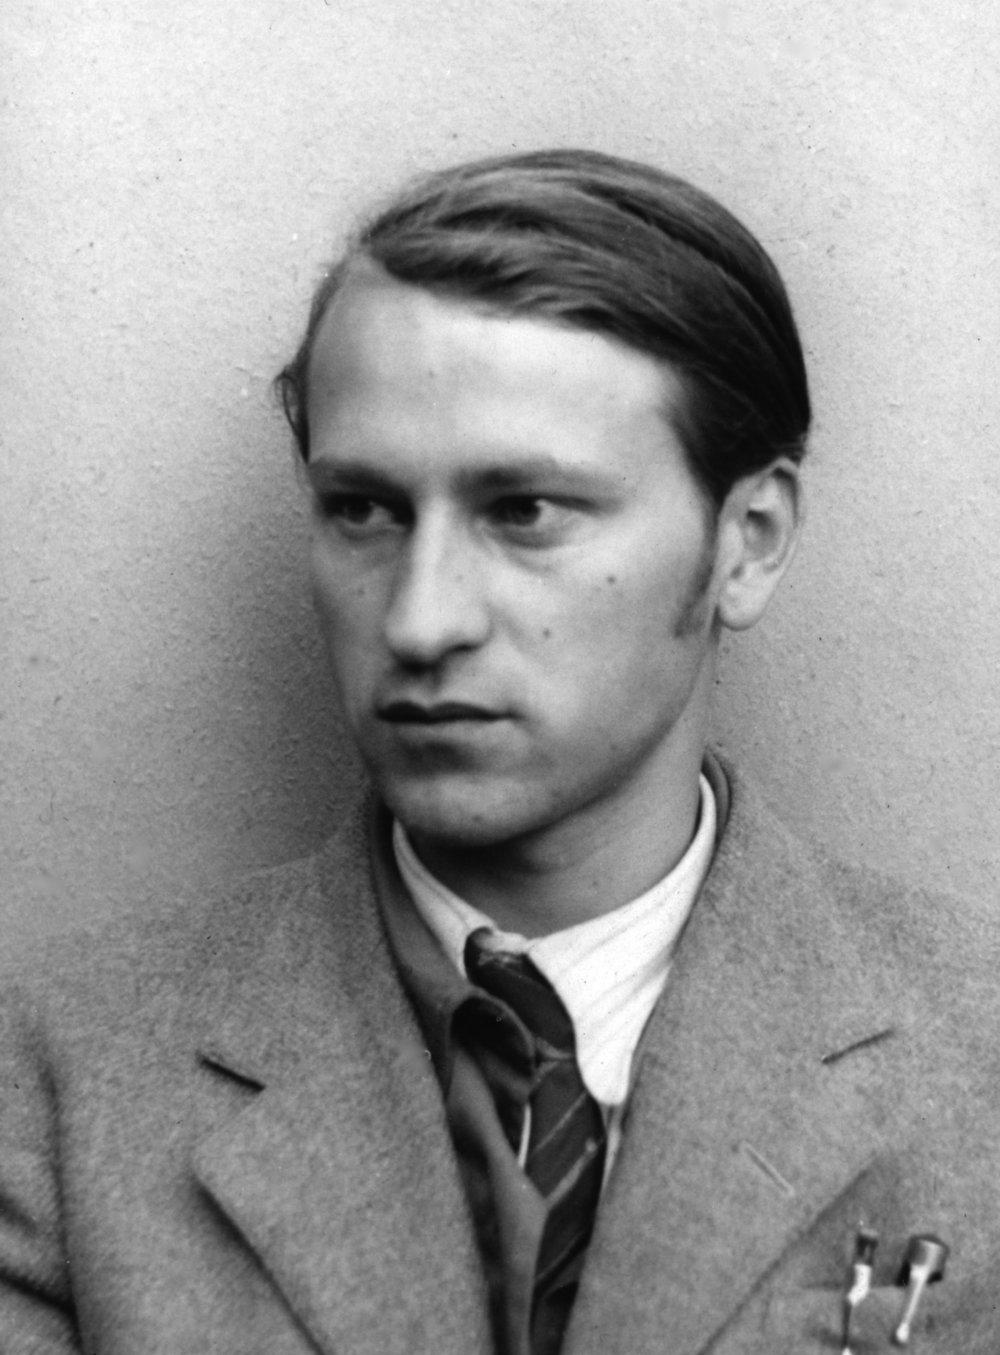 Jonas Mekas in 1947.